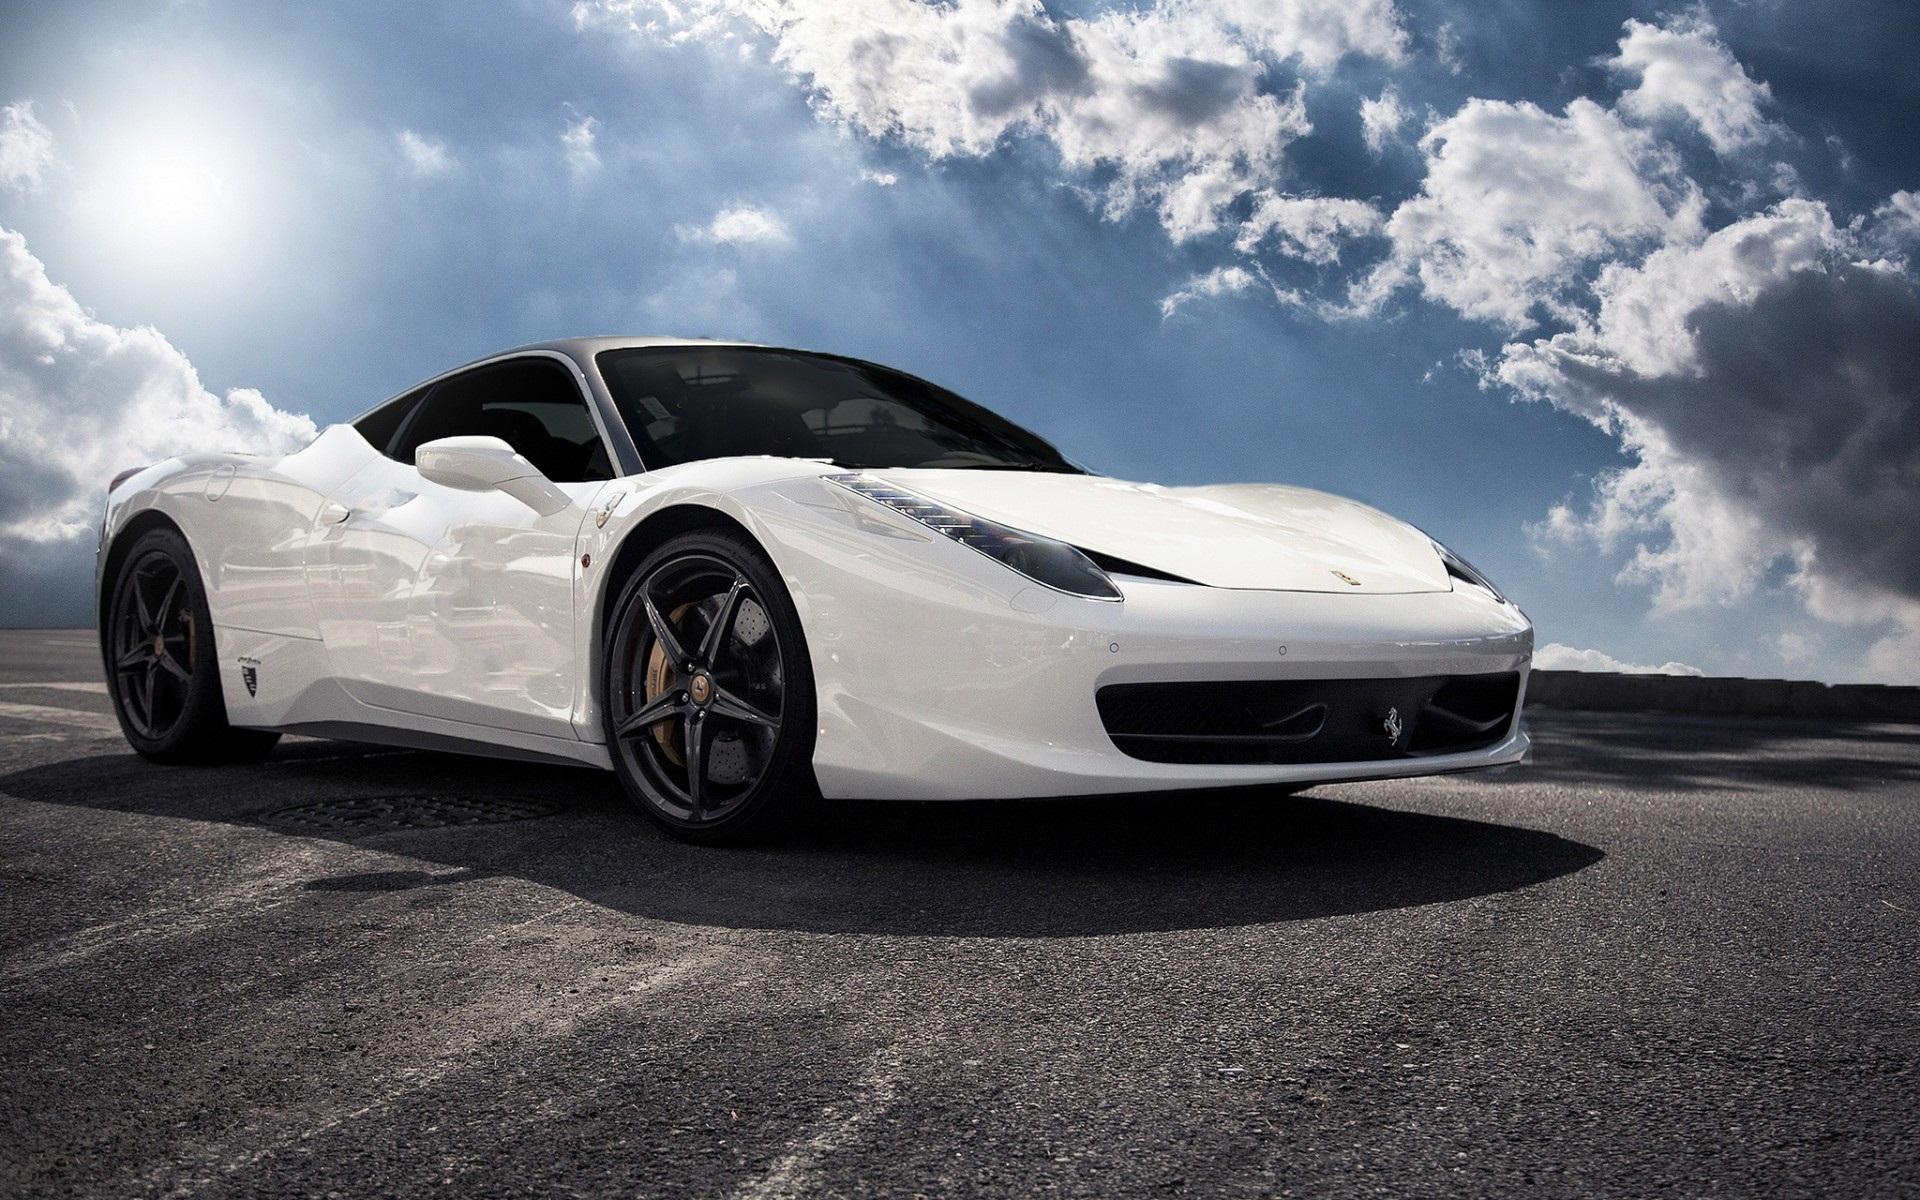 white ferrari 458 italia wallpaper hd Vehicle Pictures 1920x1200